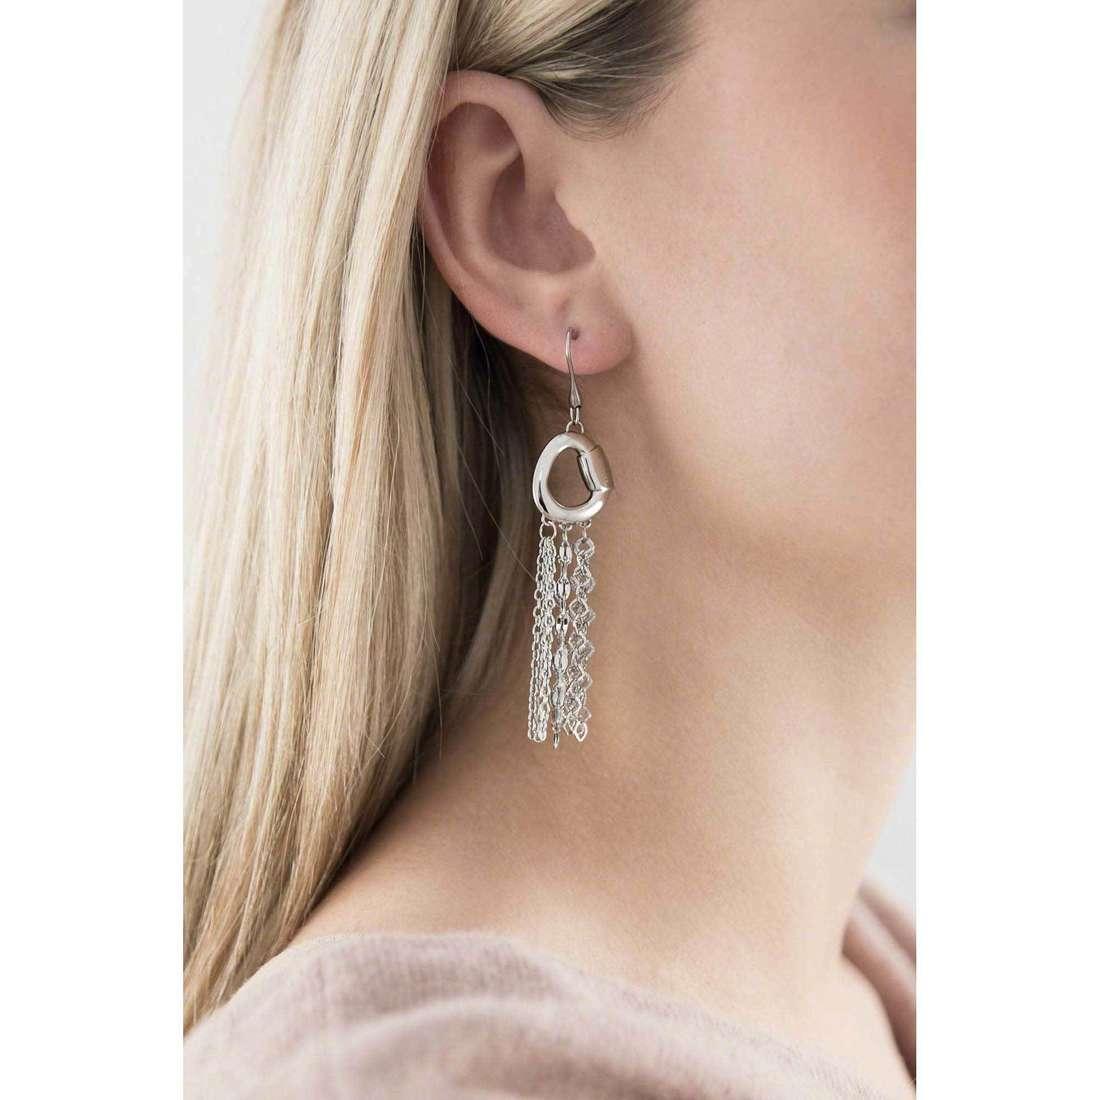 Breil boucles d'oreille SkyFall femme TJ1476 indosso